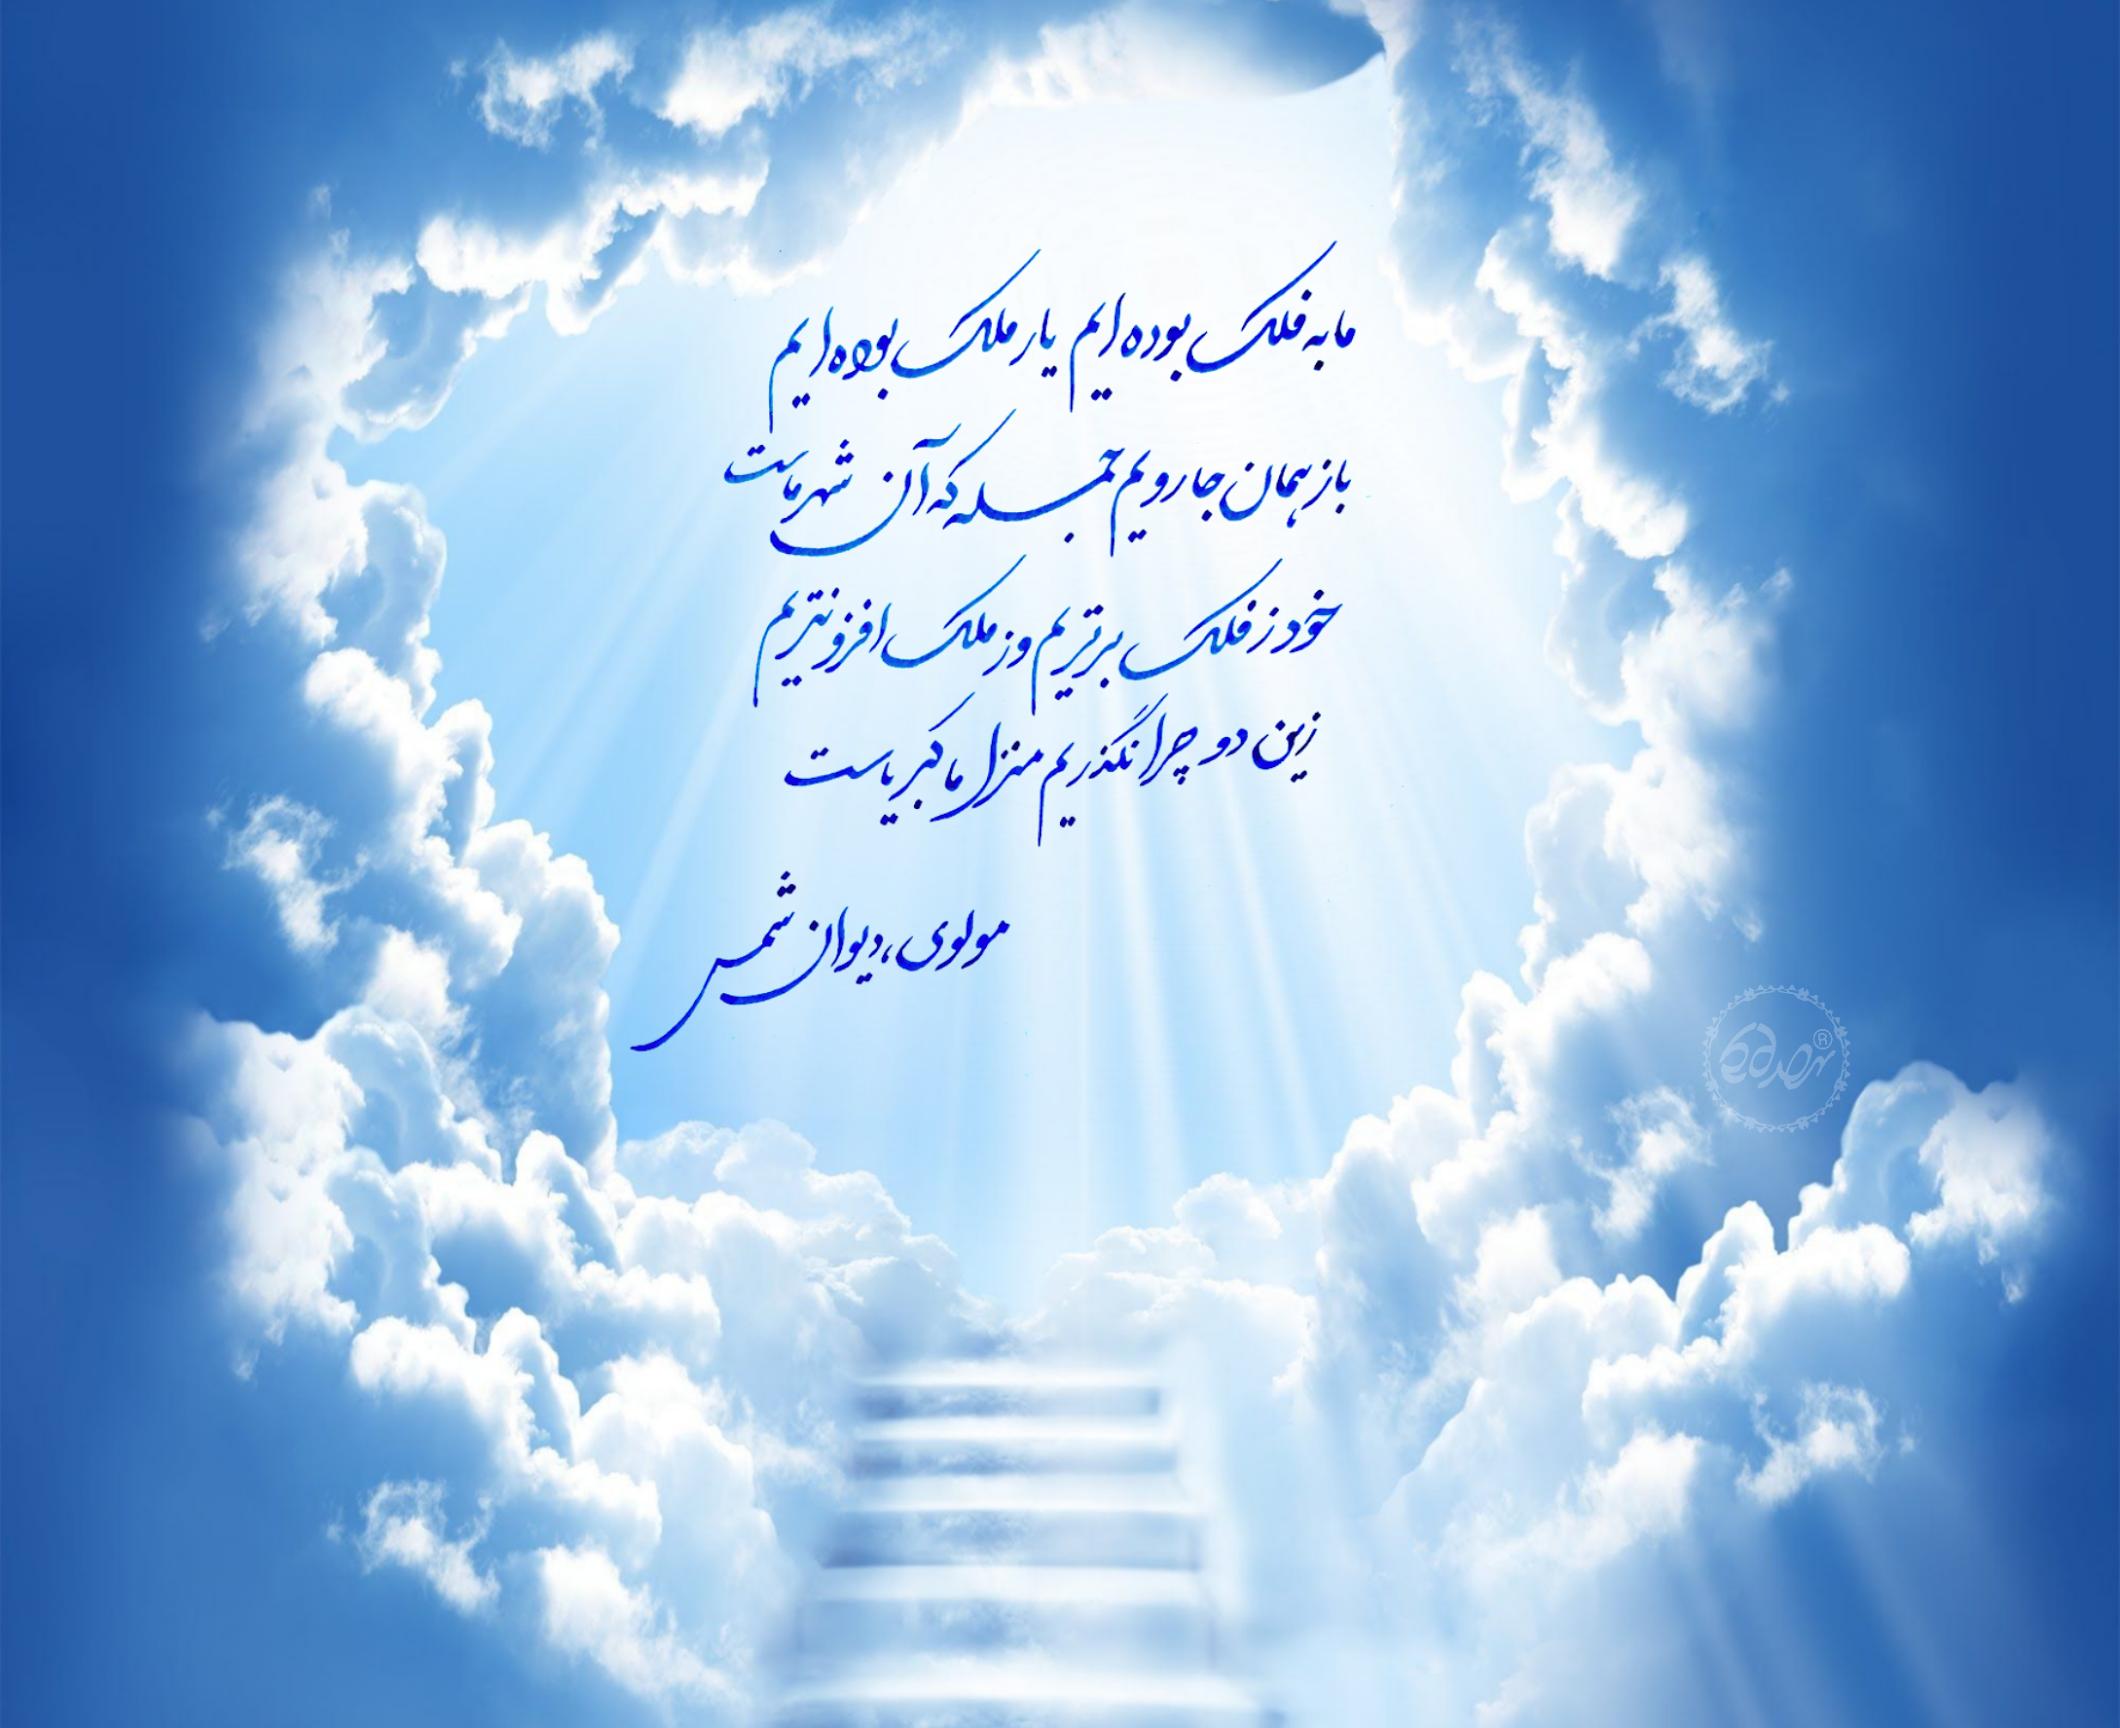 Sign In Farsi Quotes Persian Quotes Farsi Poem